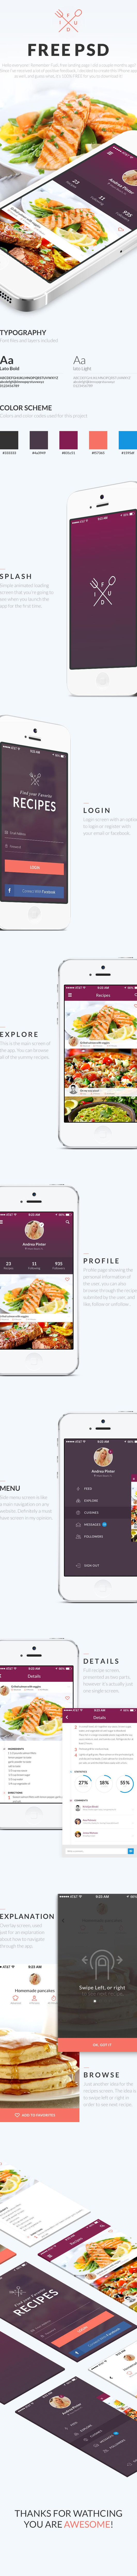 Free Psd Flat Mobile App Ui On Behance